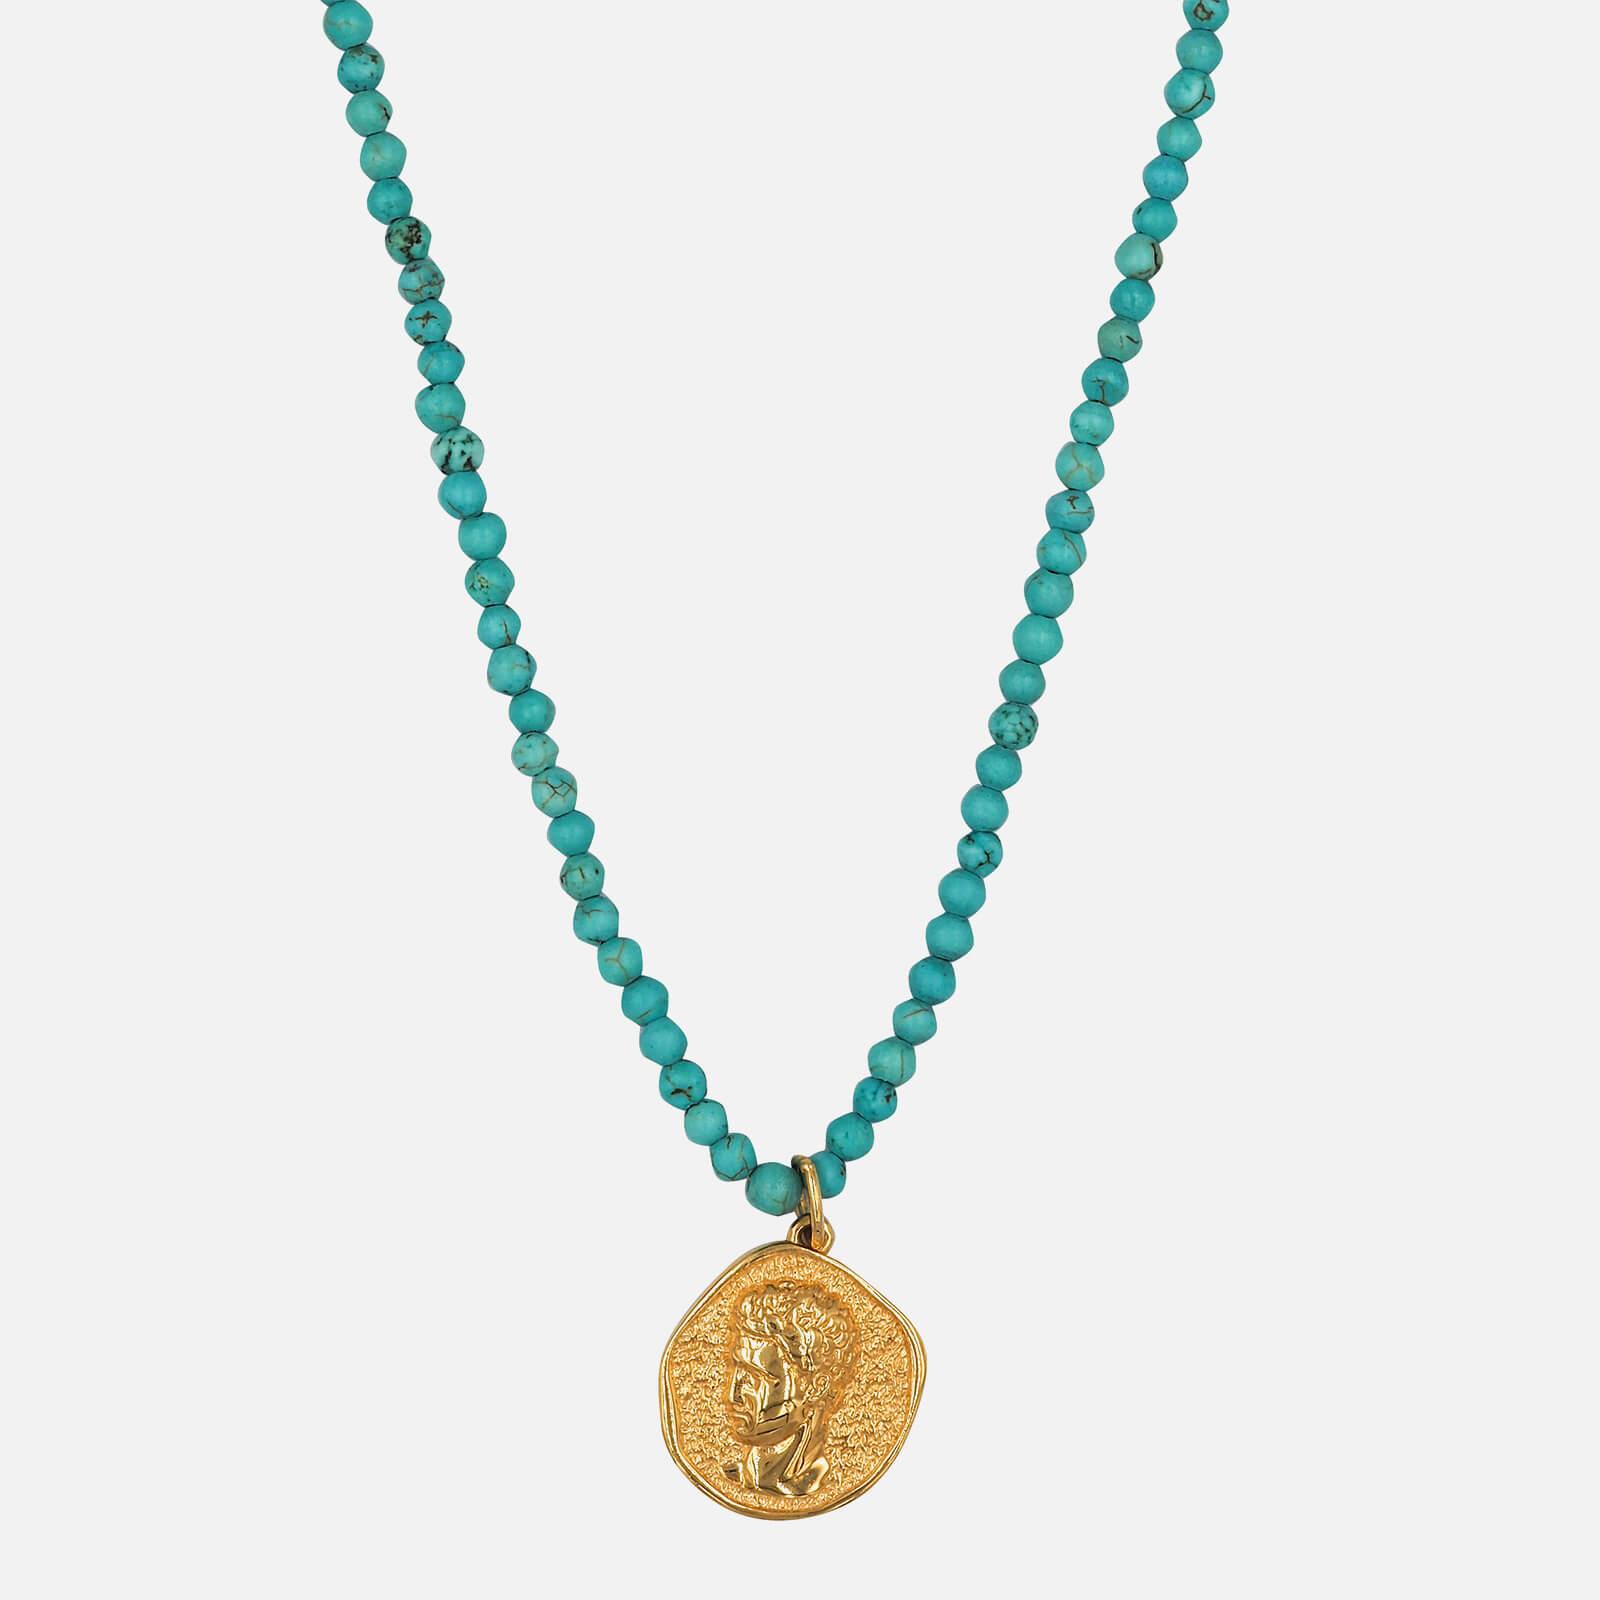 Hermina Athens Women's Hermis Necklace - Turquoise